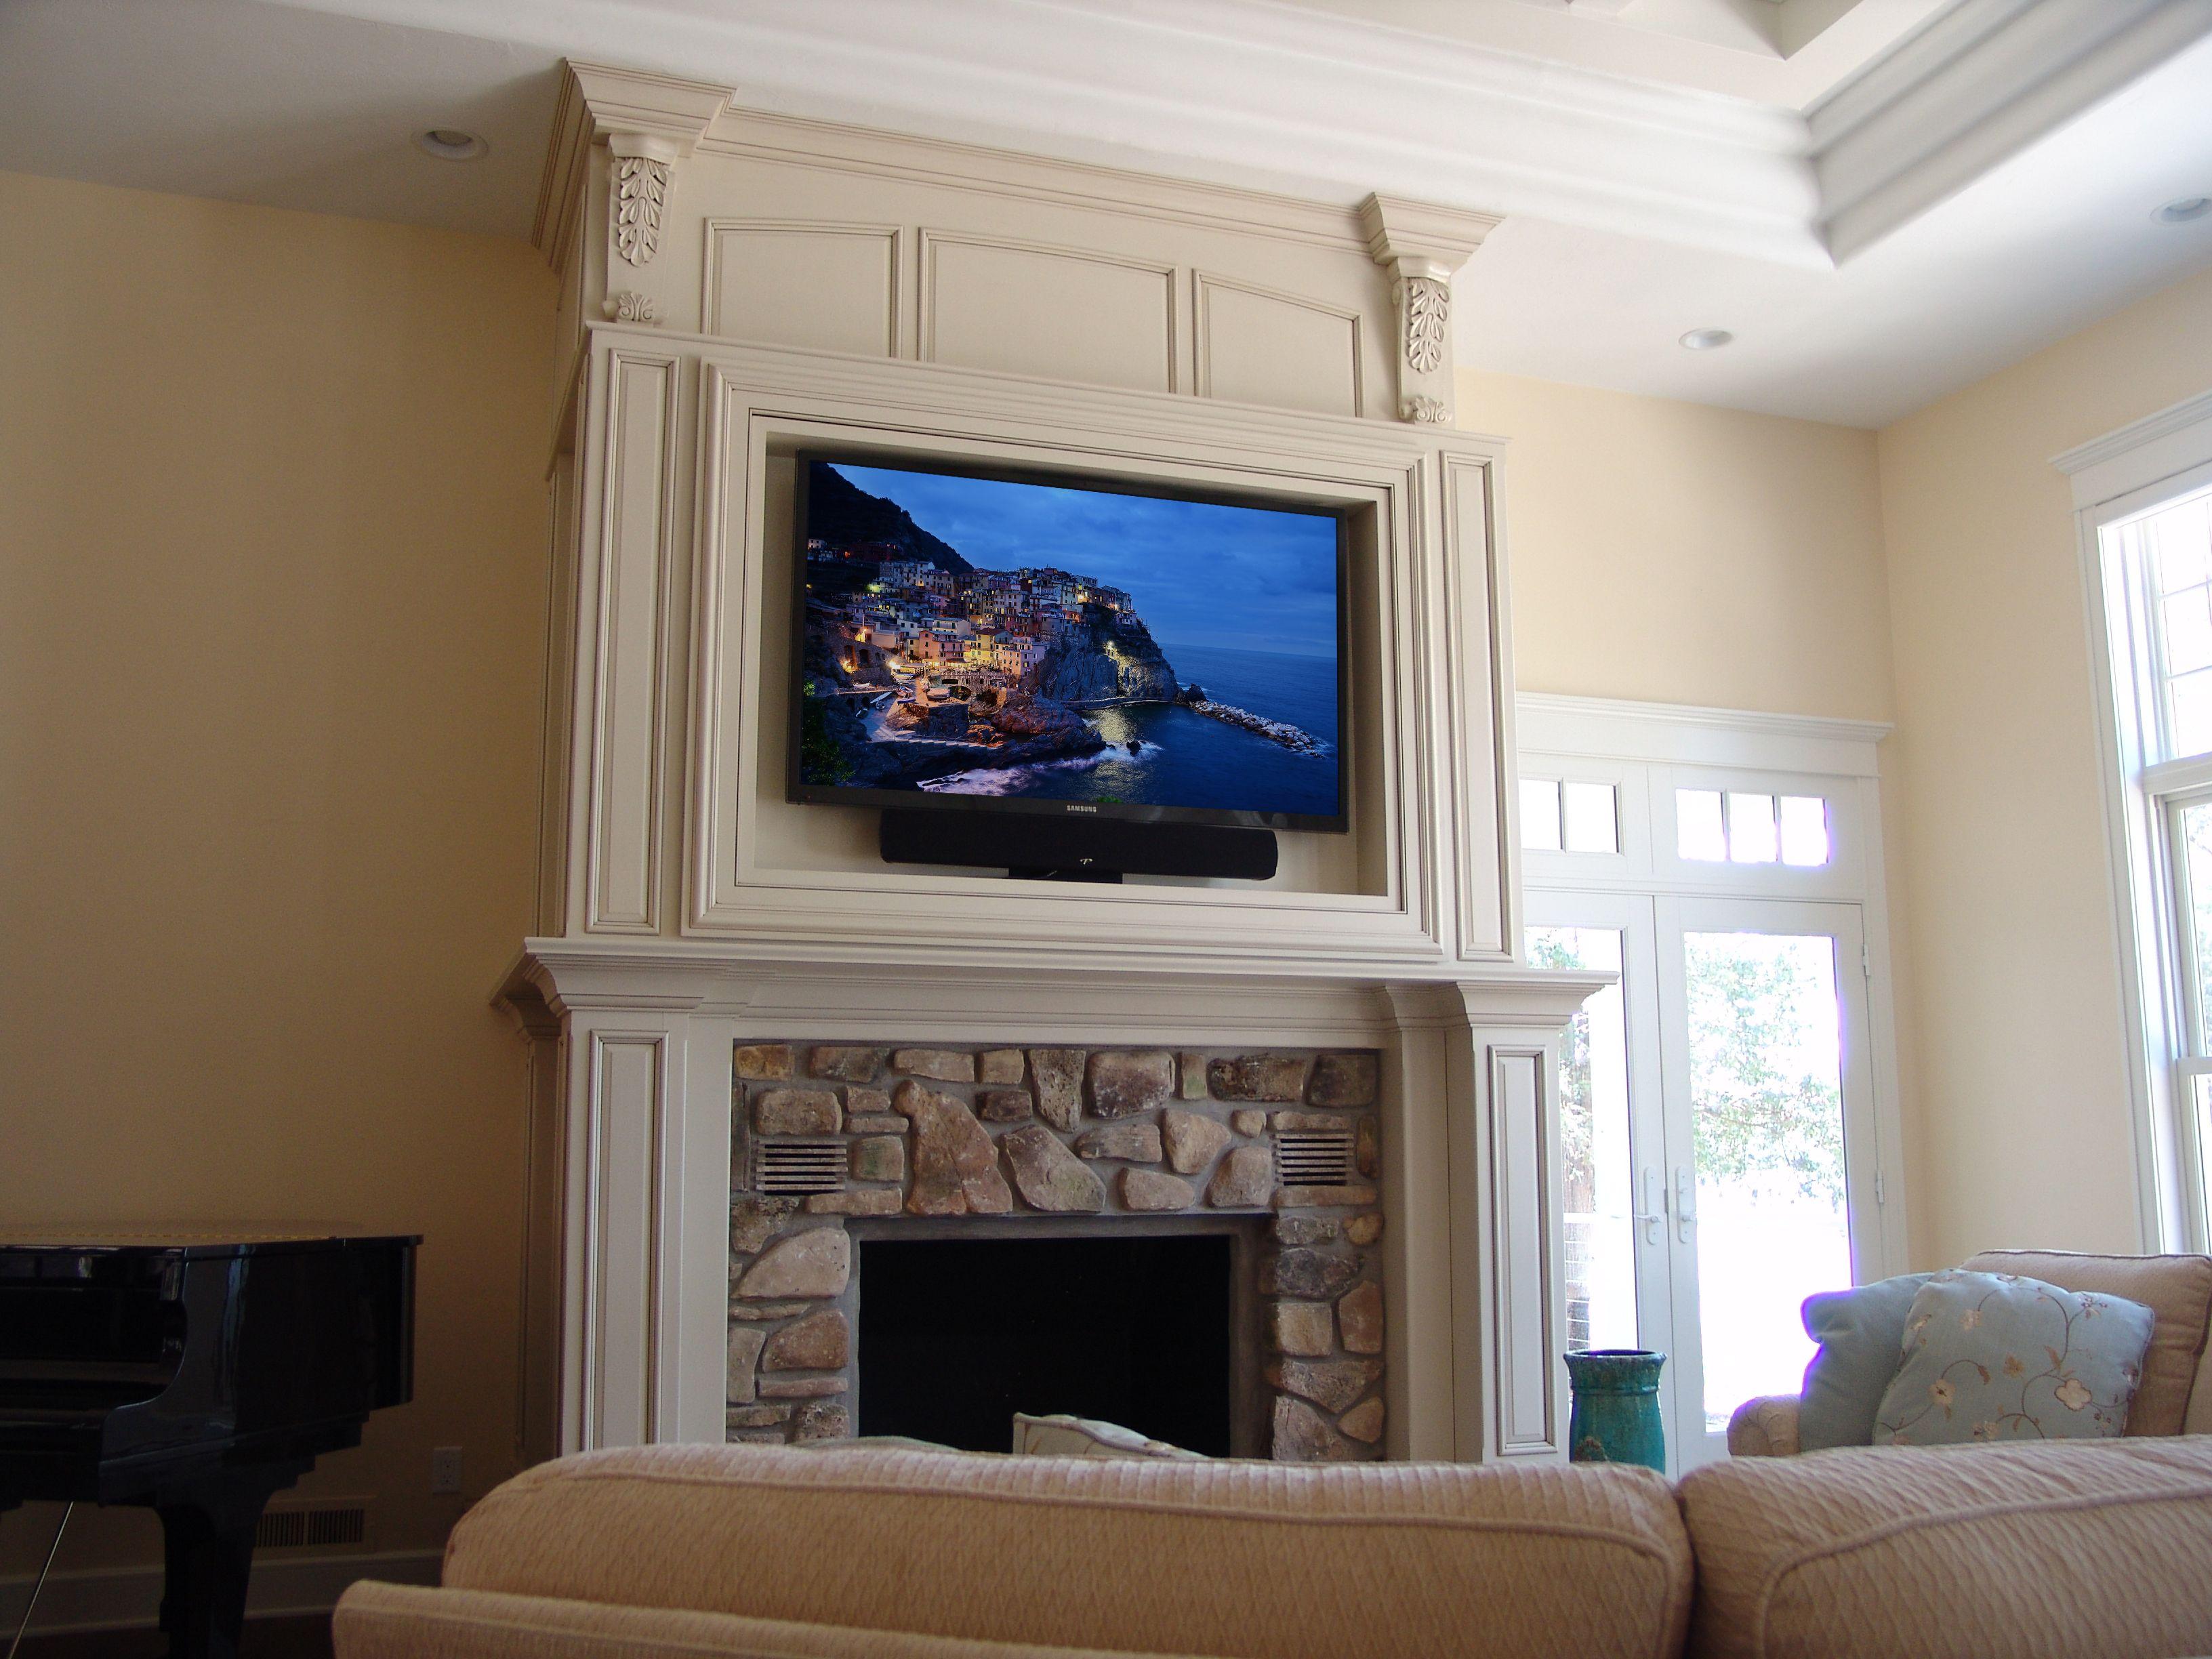 flatscreen tv and soundbar over a stone fireplace with wood surround rh pinterest com